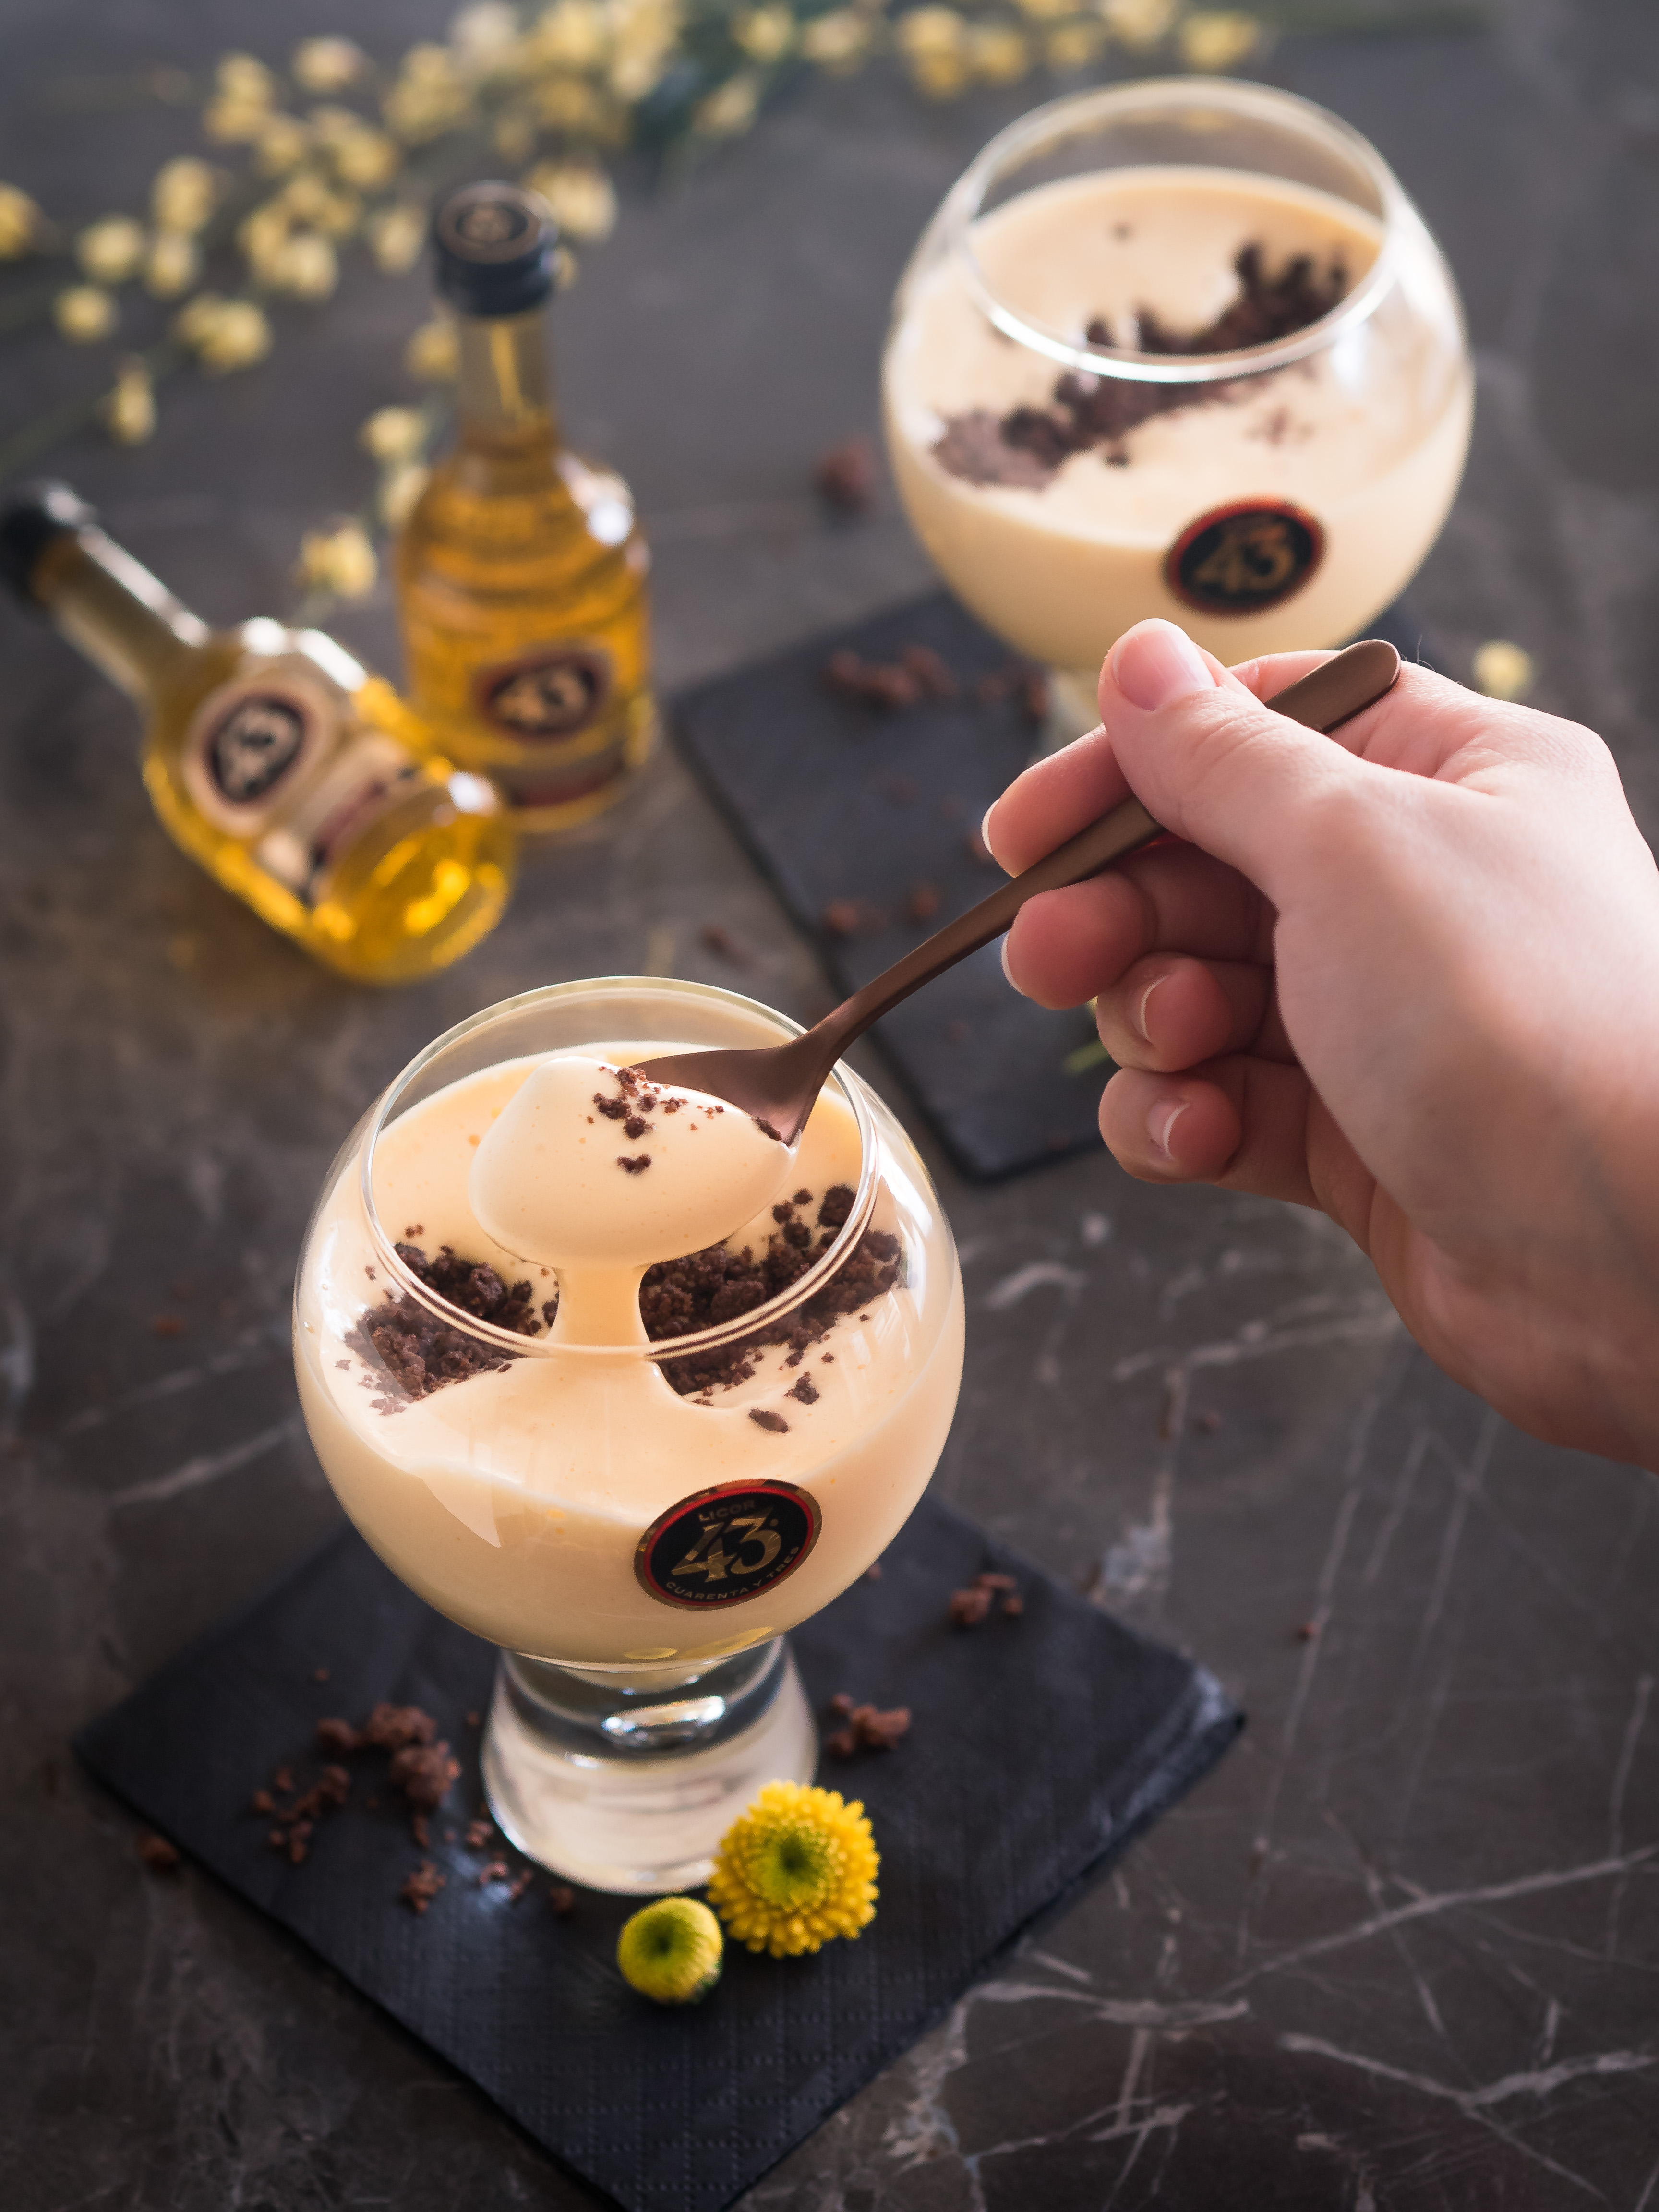 Zabaione mit Coffeecrumble